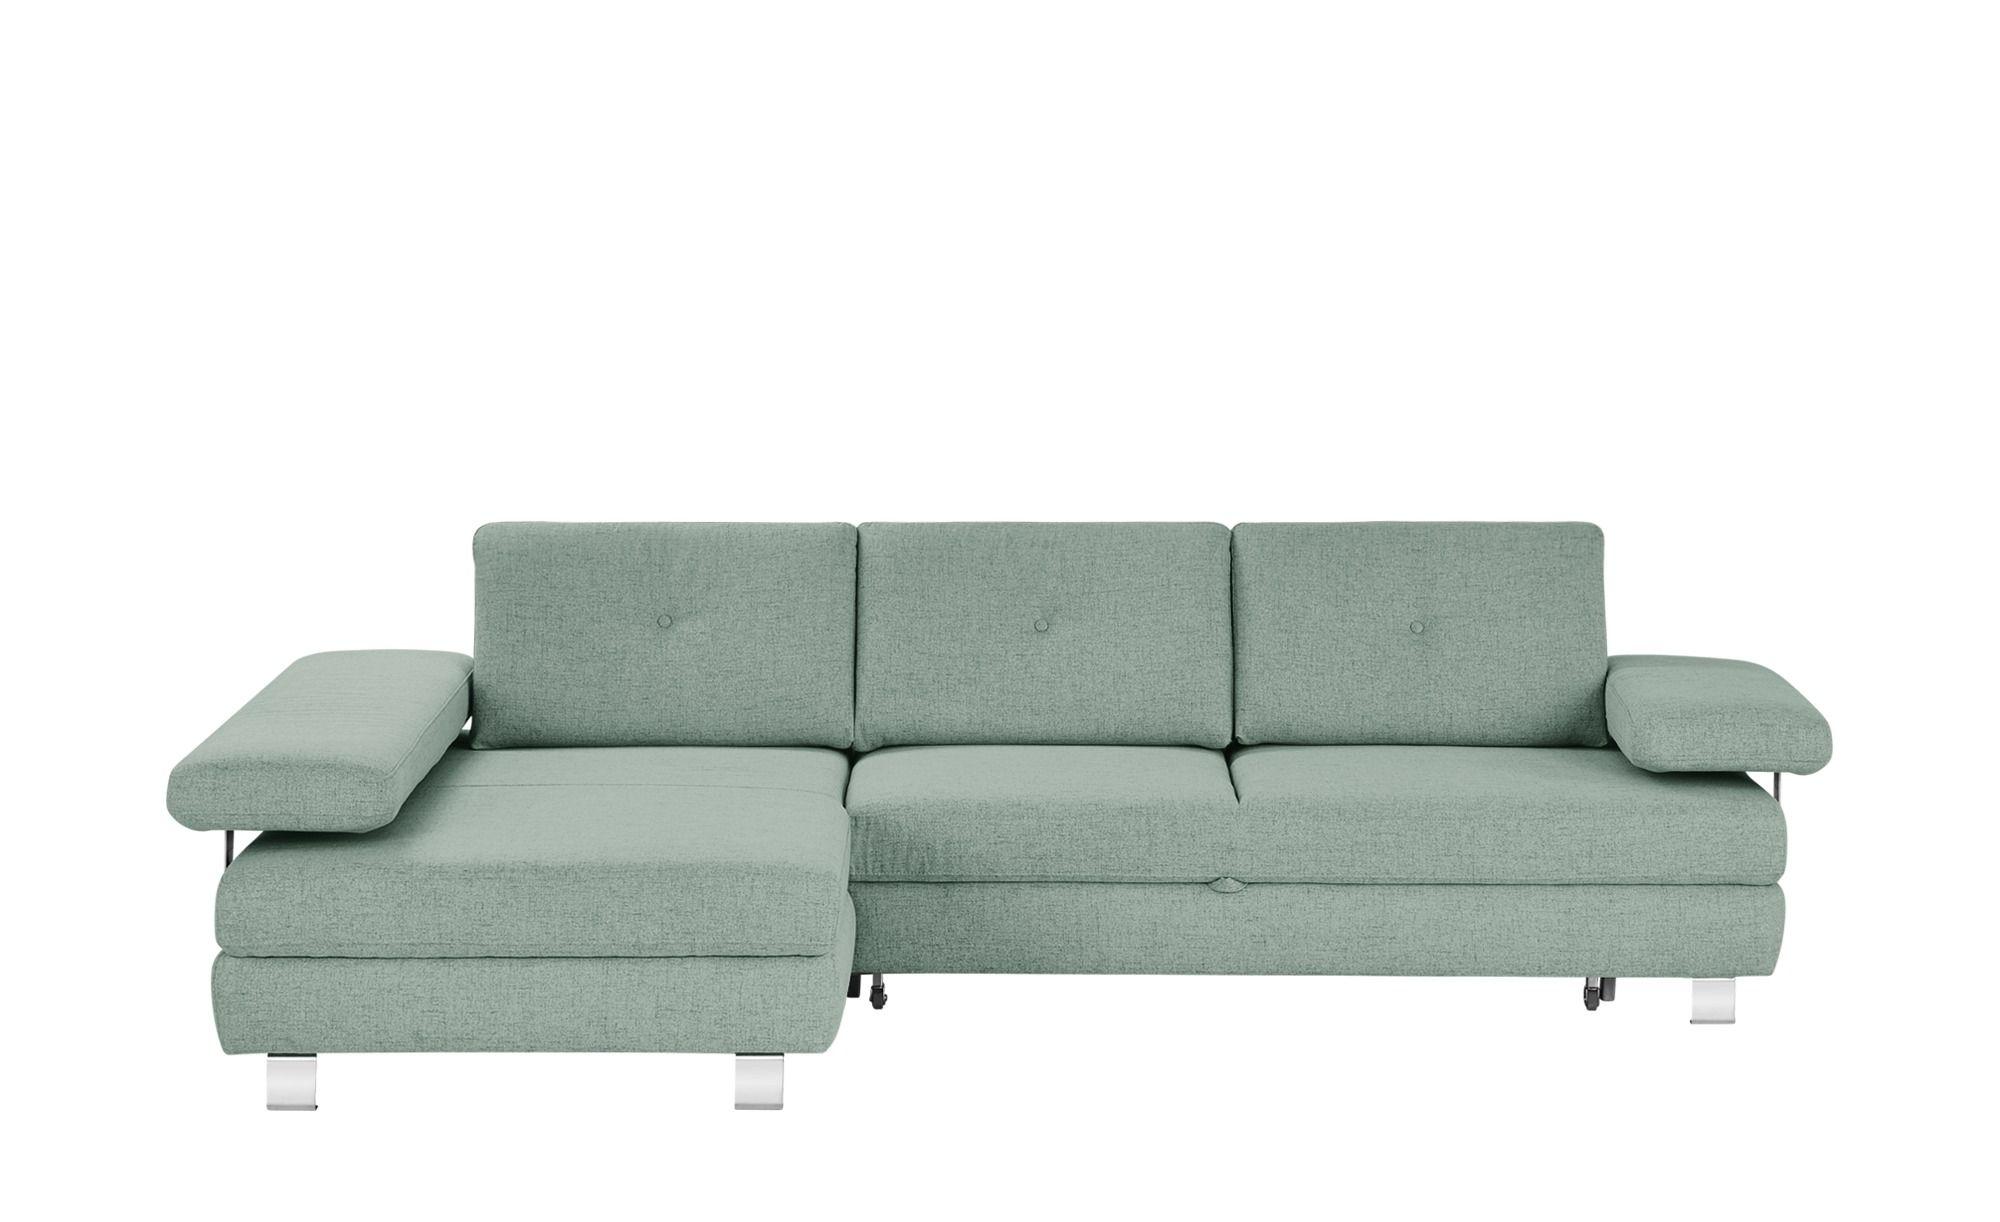 Switch Ecksofa Garda Gefunden Bei Mobel Hoffner In 2020 Sofa